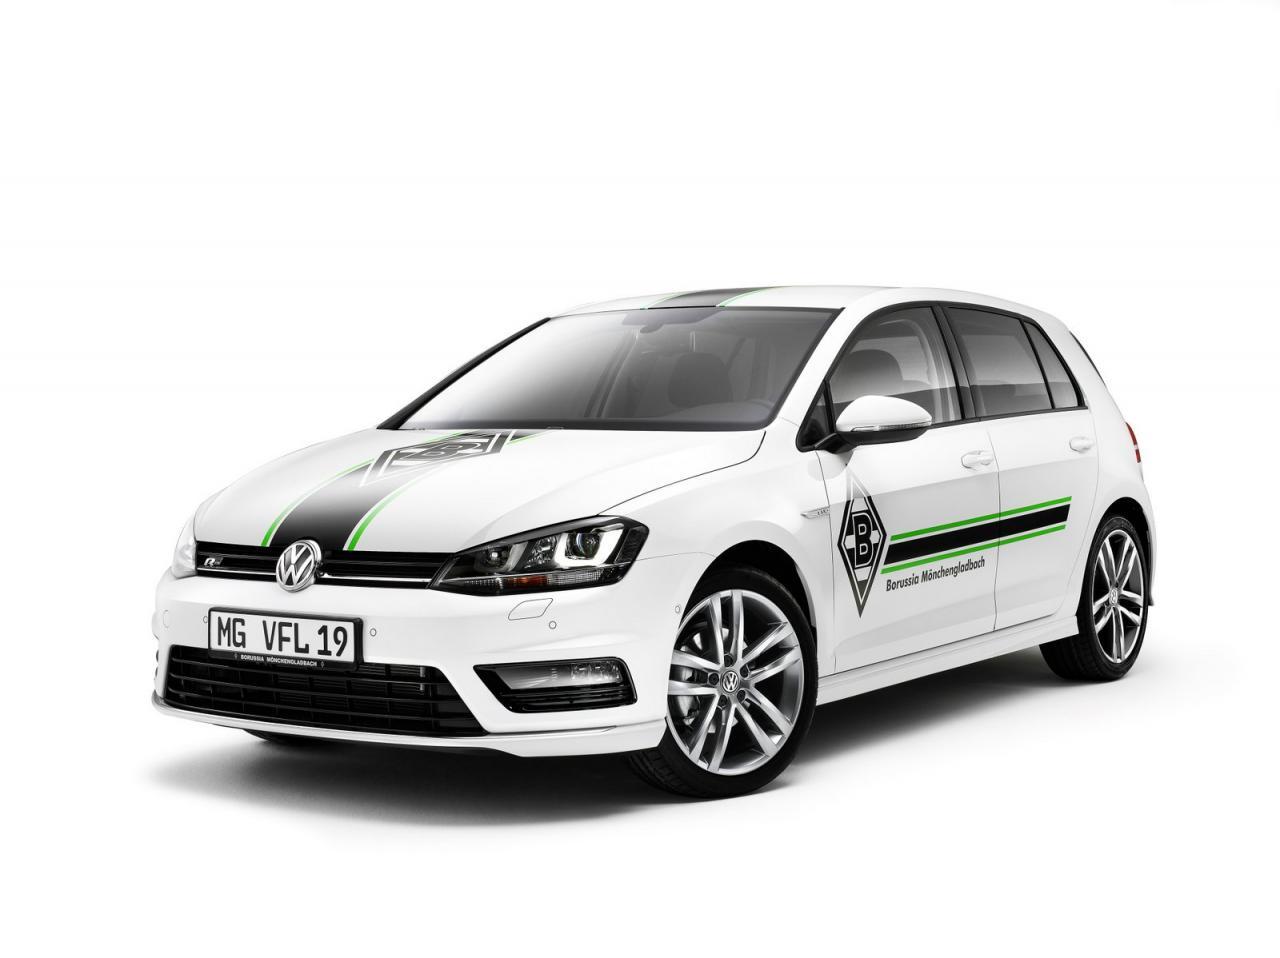 Volkswagen Golf Borussia Mönchengladbach special edition